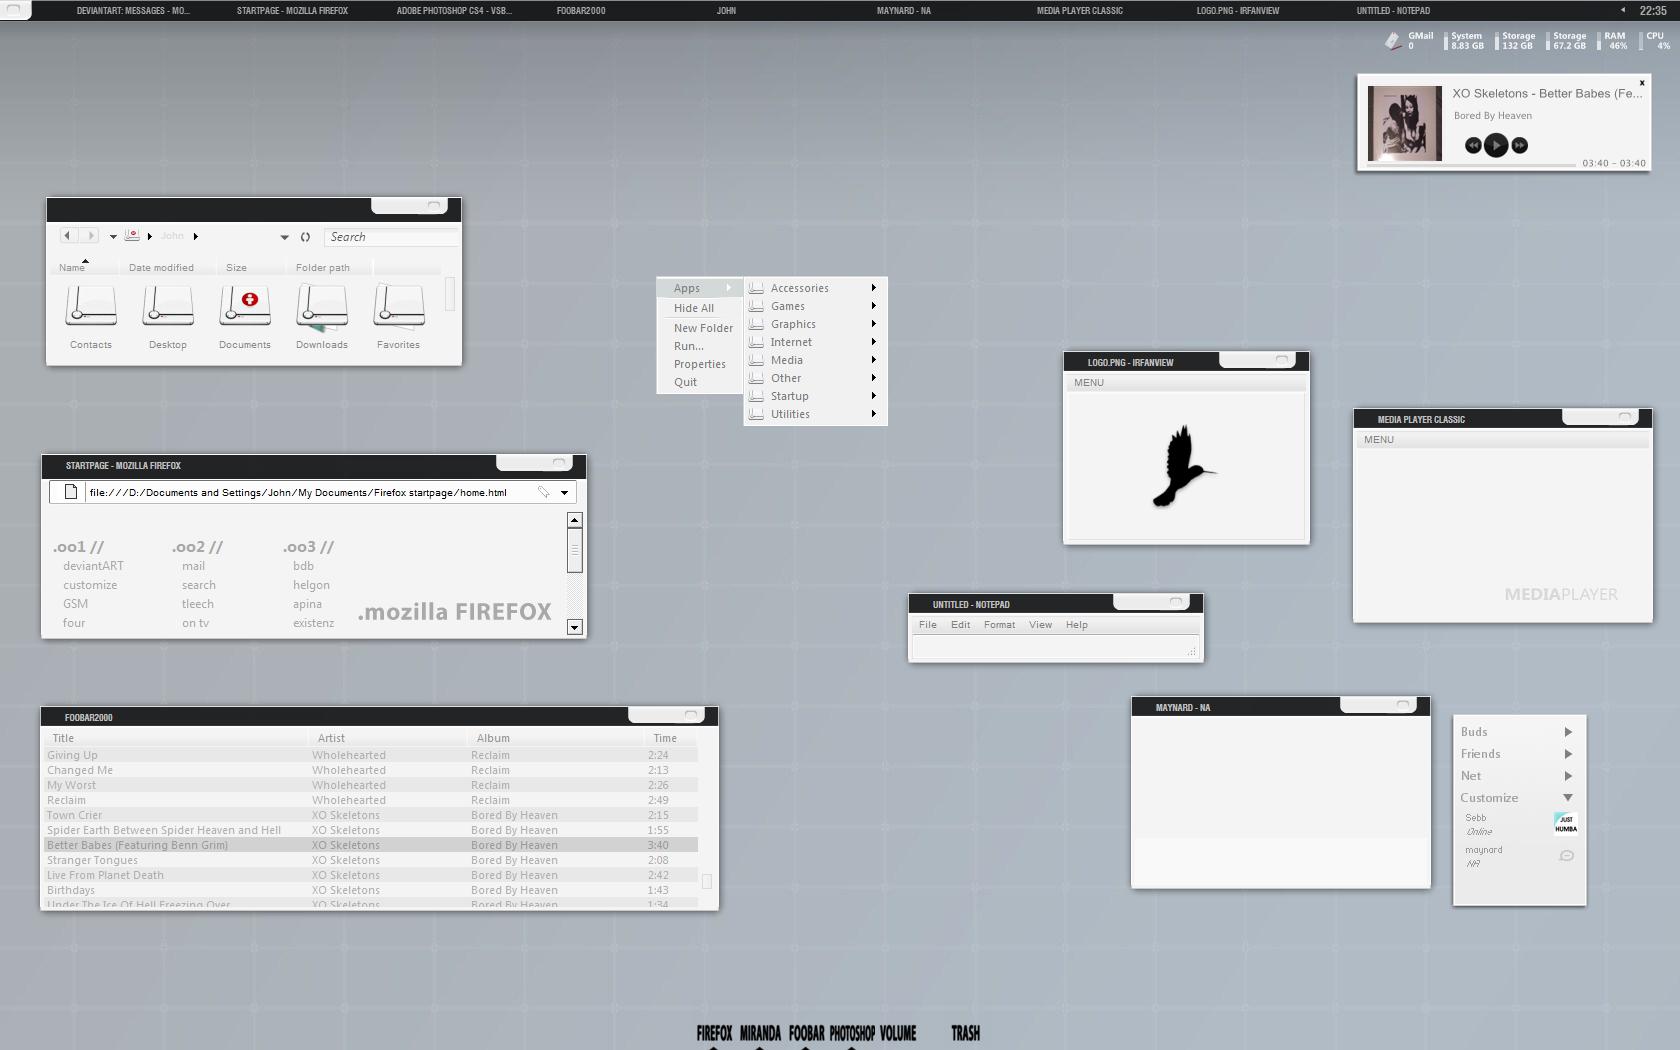 Desktop 17-11-08 by invaderjohn